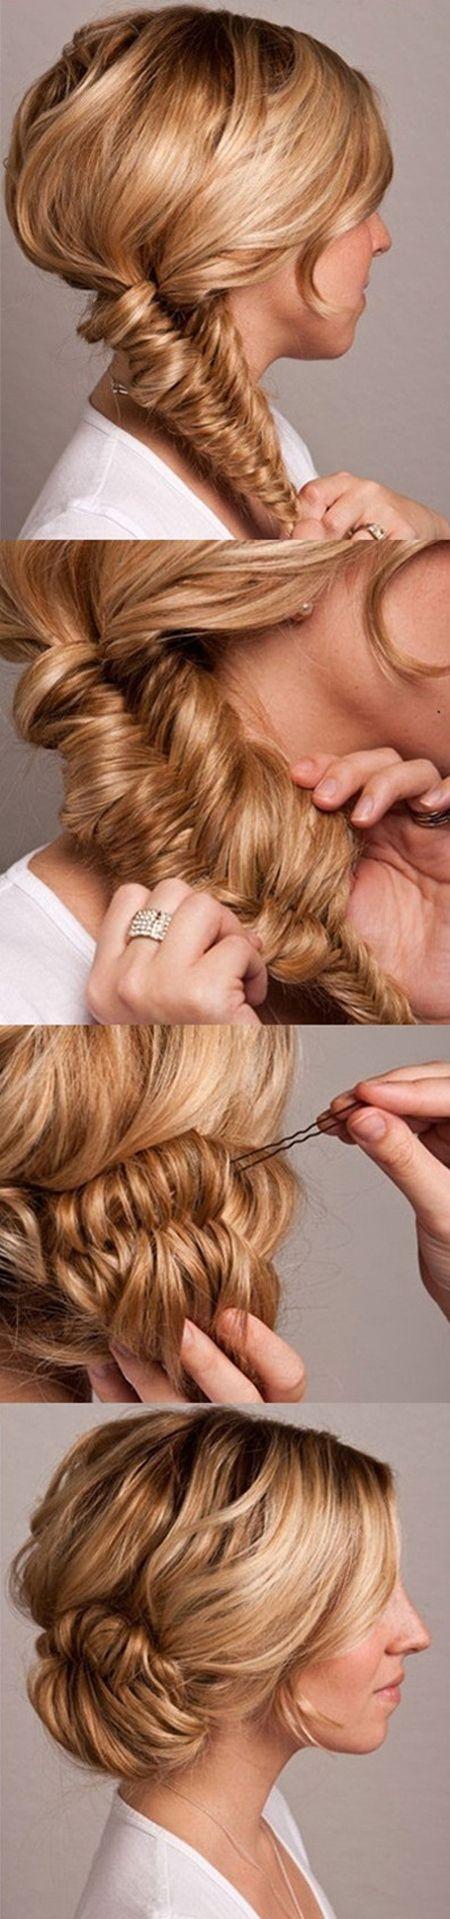 The Fishtail Bun | #Pinterest #Tutorials #pony #hairinfographic #hairtutorials #braids #styles #beautyhacks #hair #hairstyle #DIY